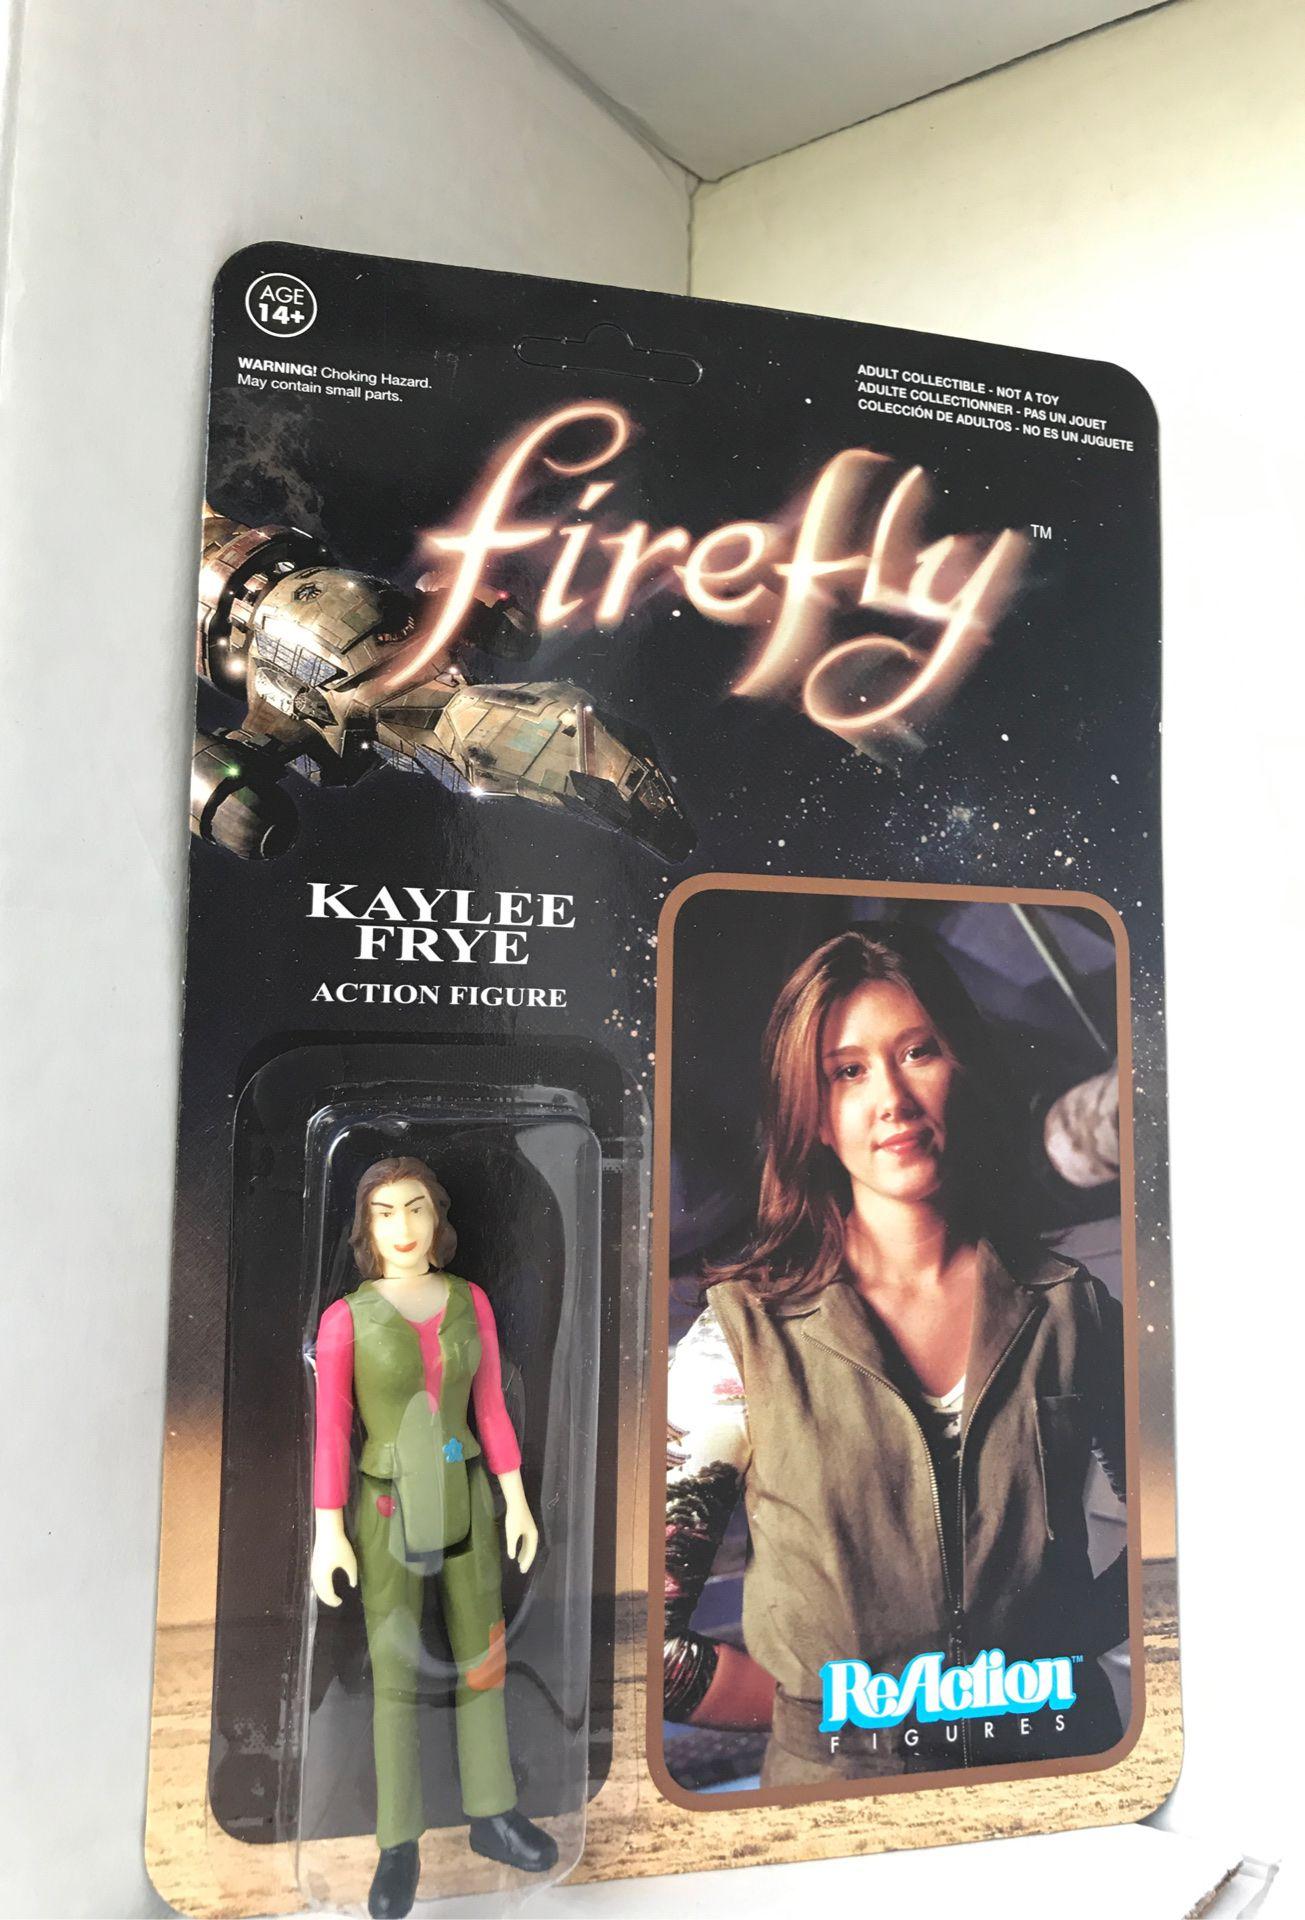 Firefly Kaylee Frye Action Figure